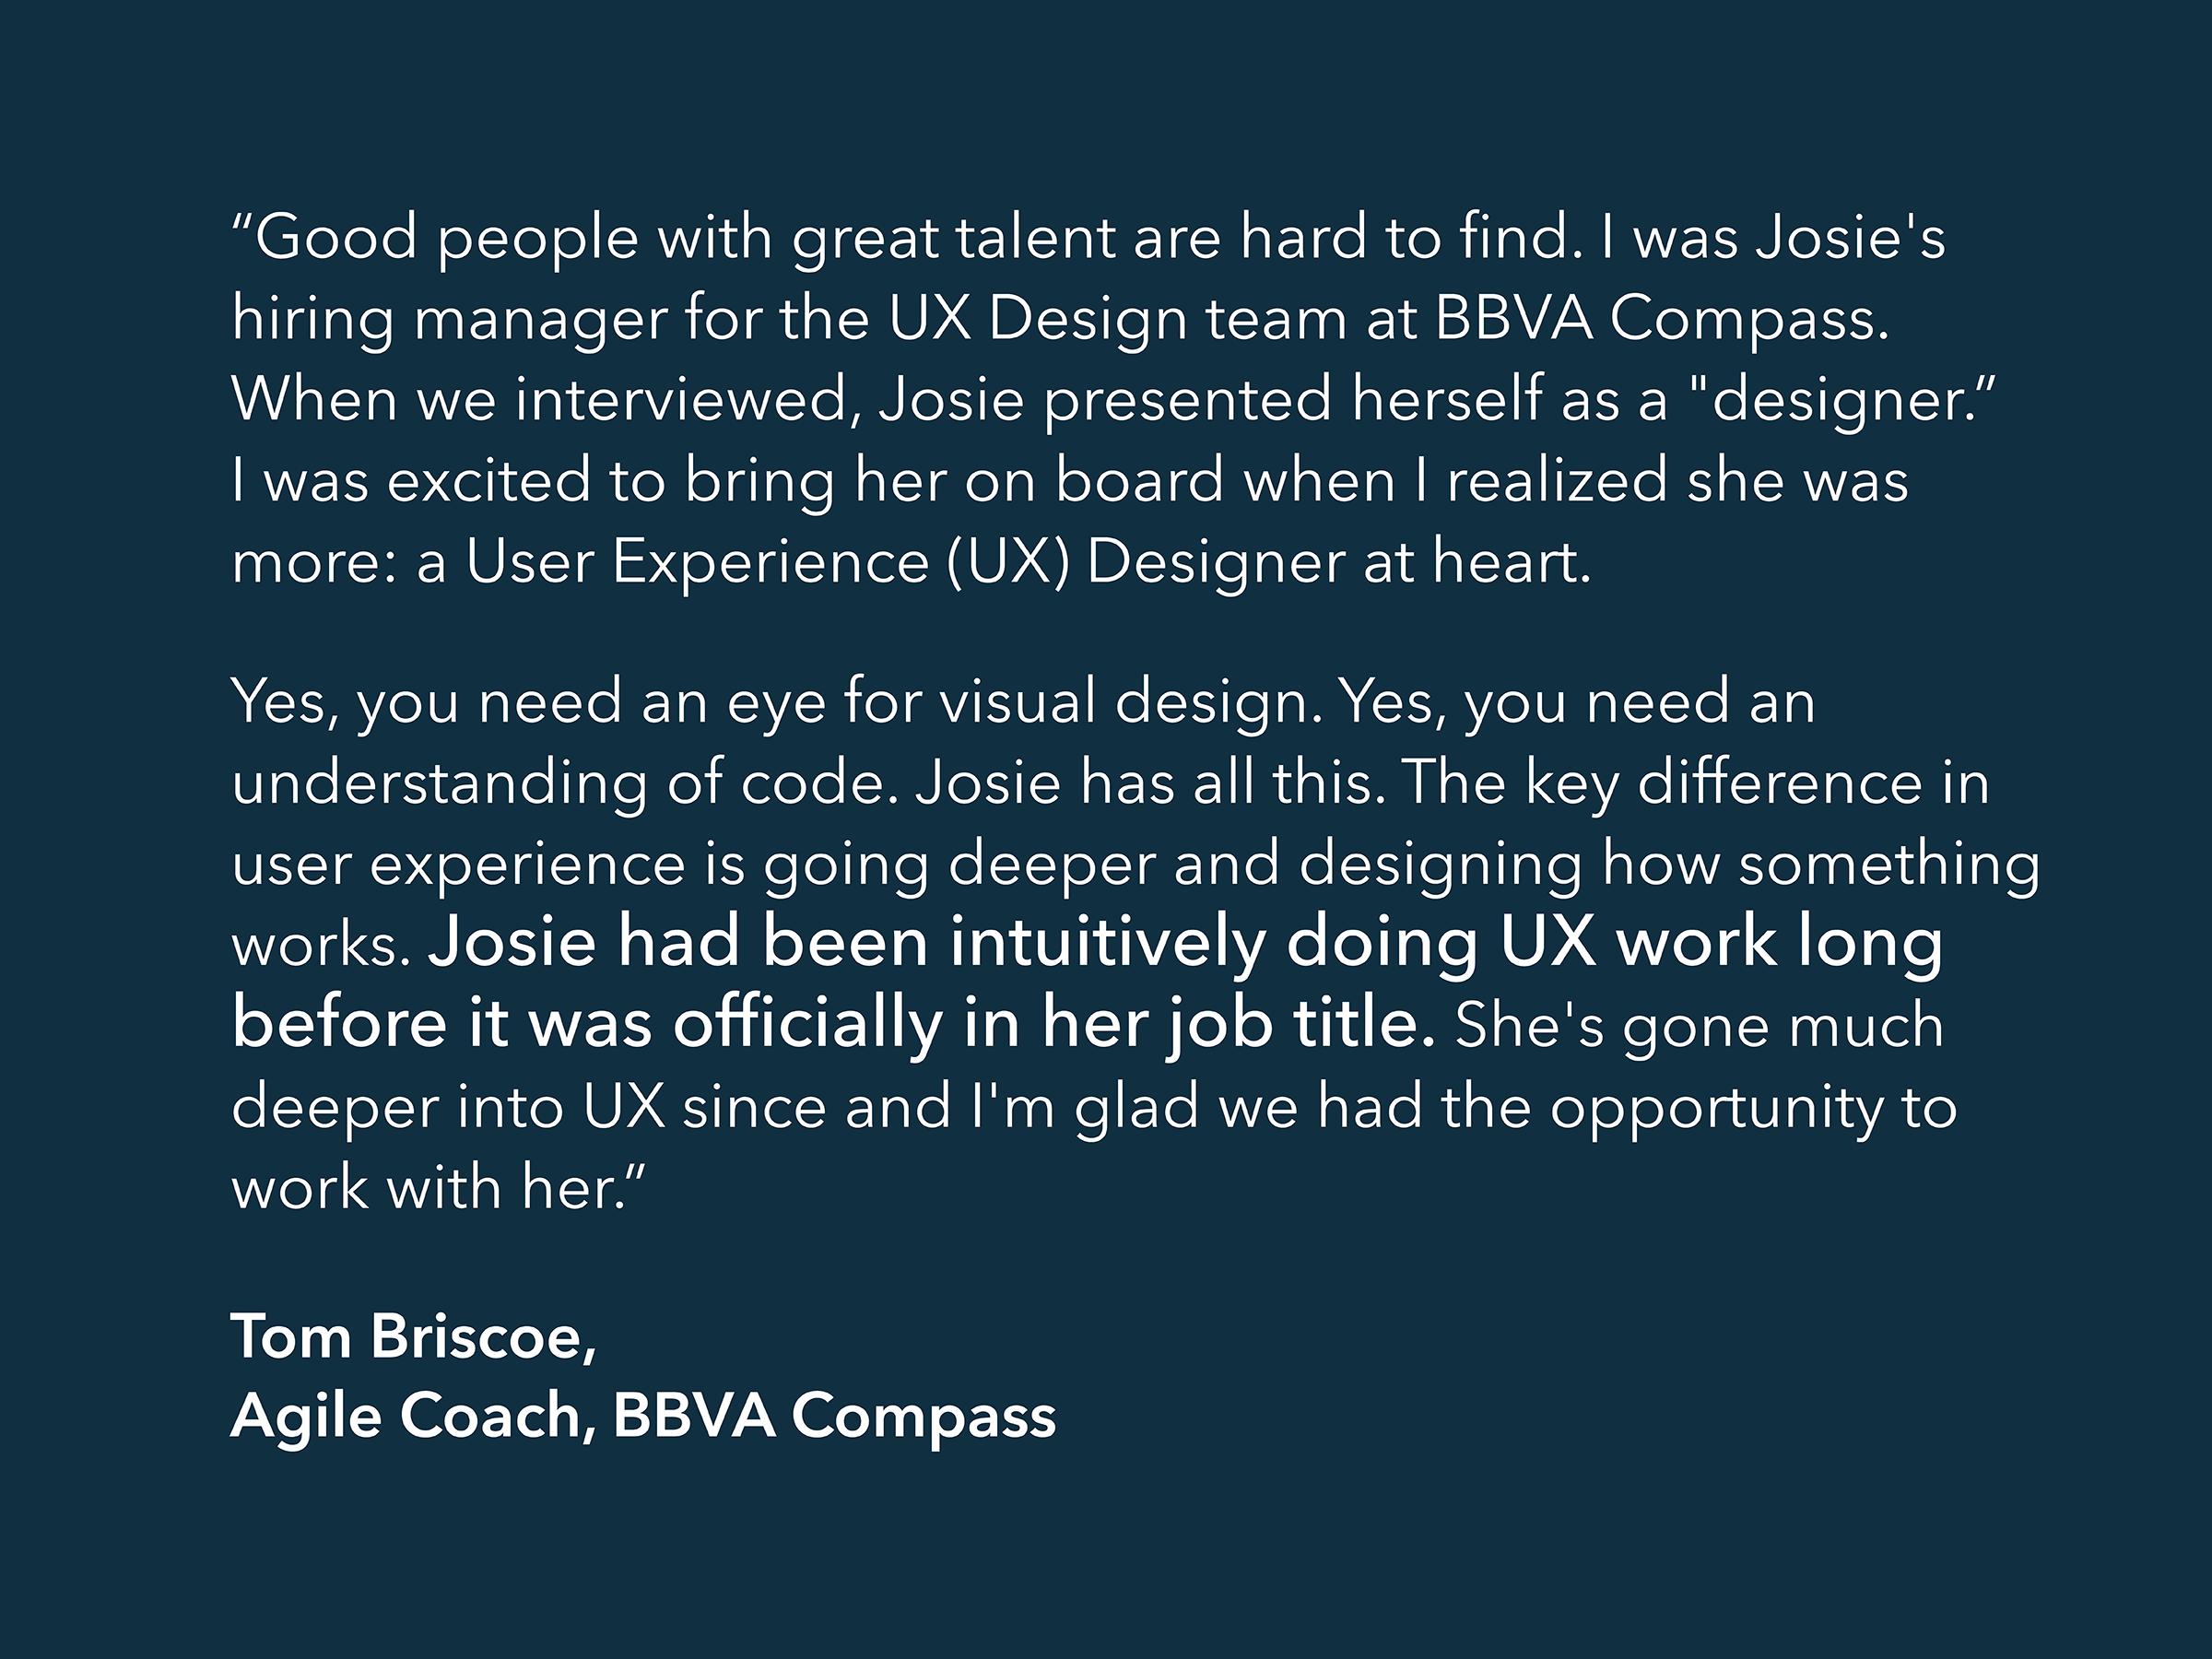 JCdesignco_reviews_bbva-06.png